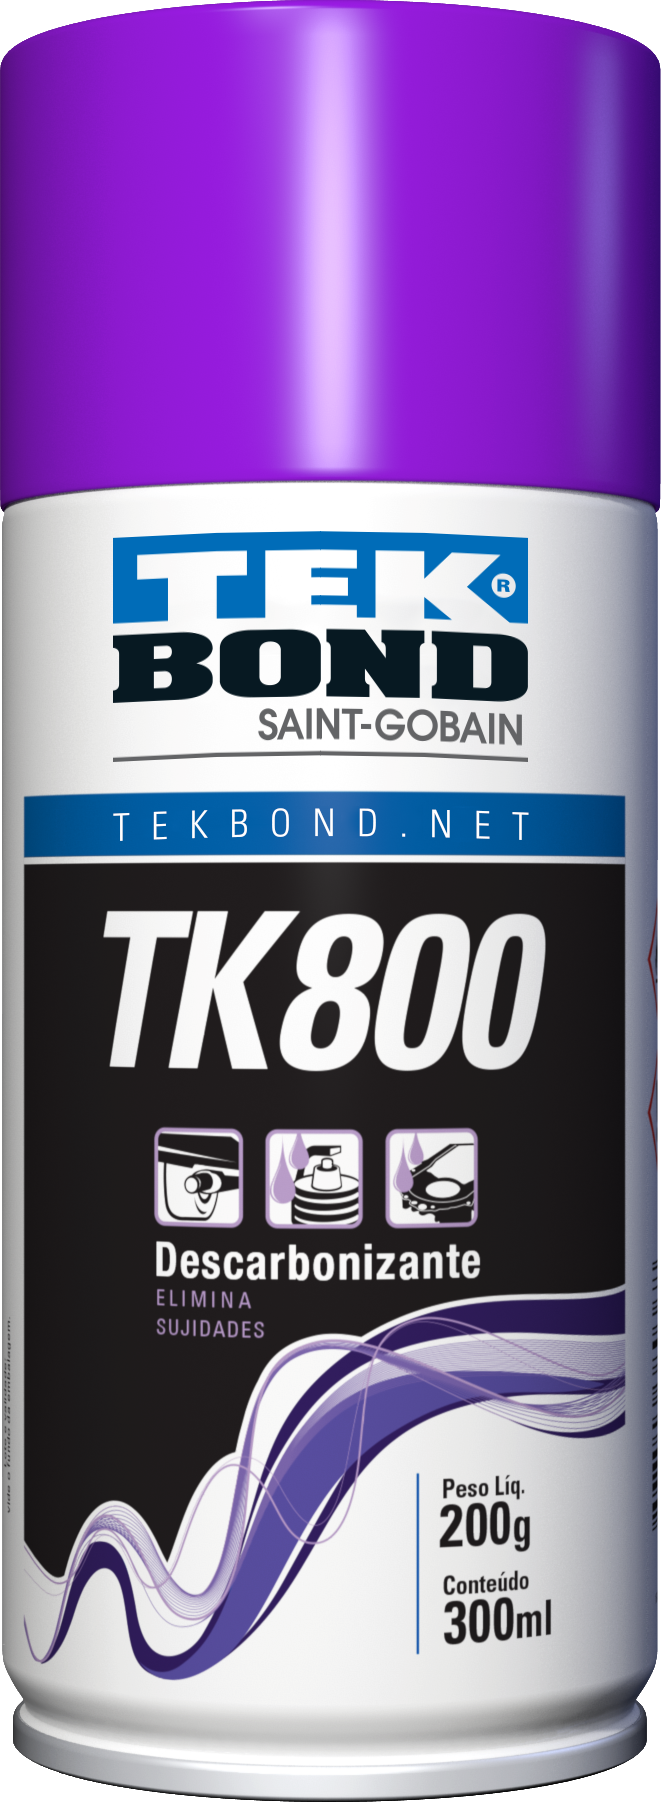 TK800